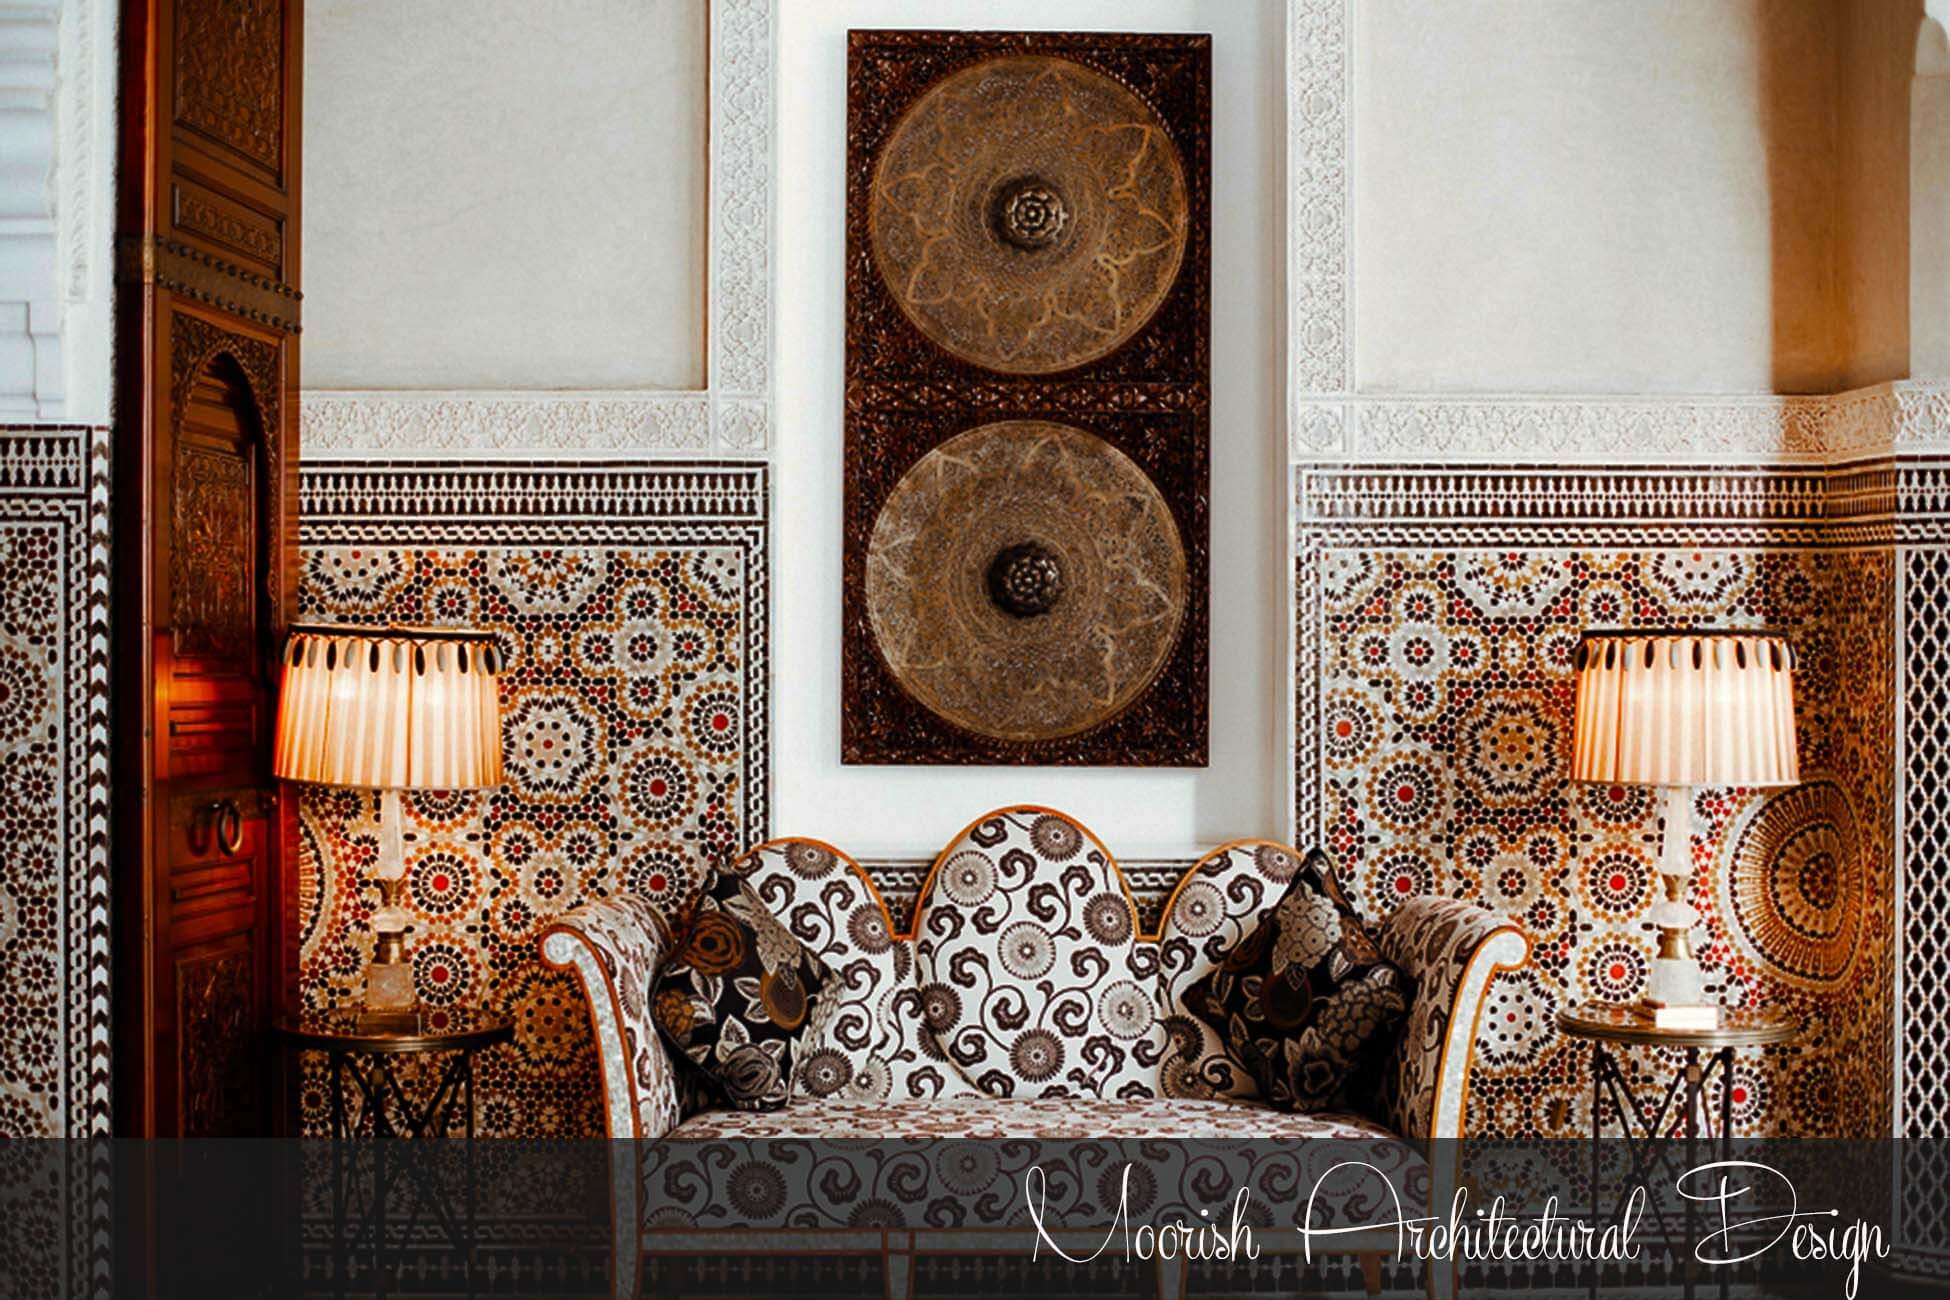 Moorish Architectural Design from Alhambra Spain